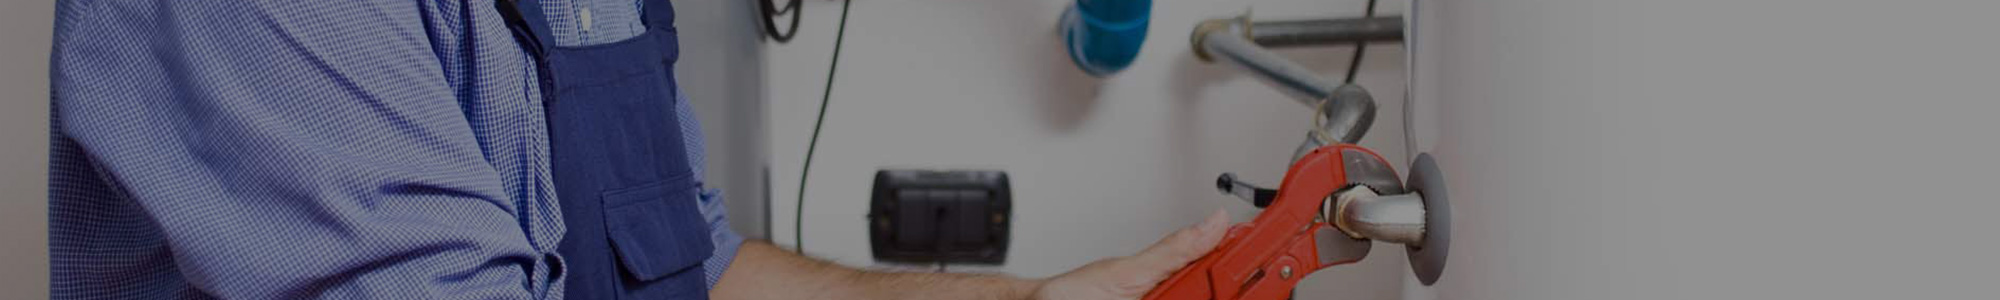 installation pompe chaleur en maine et loire 49 id climatisation. Black Bedroom Furniture Sets. Home Design Ideas